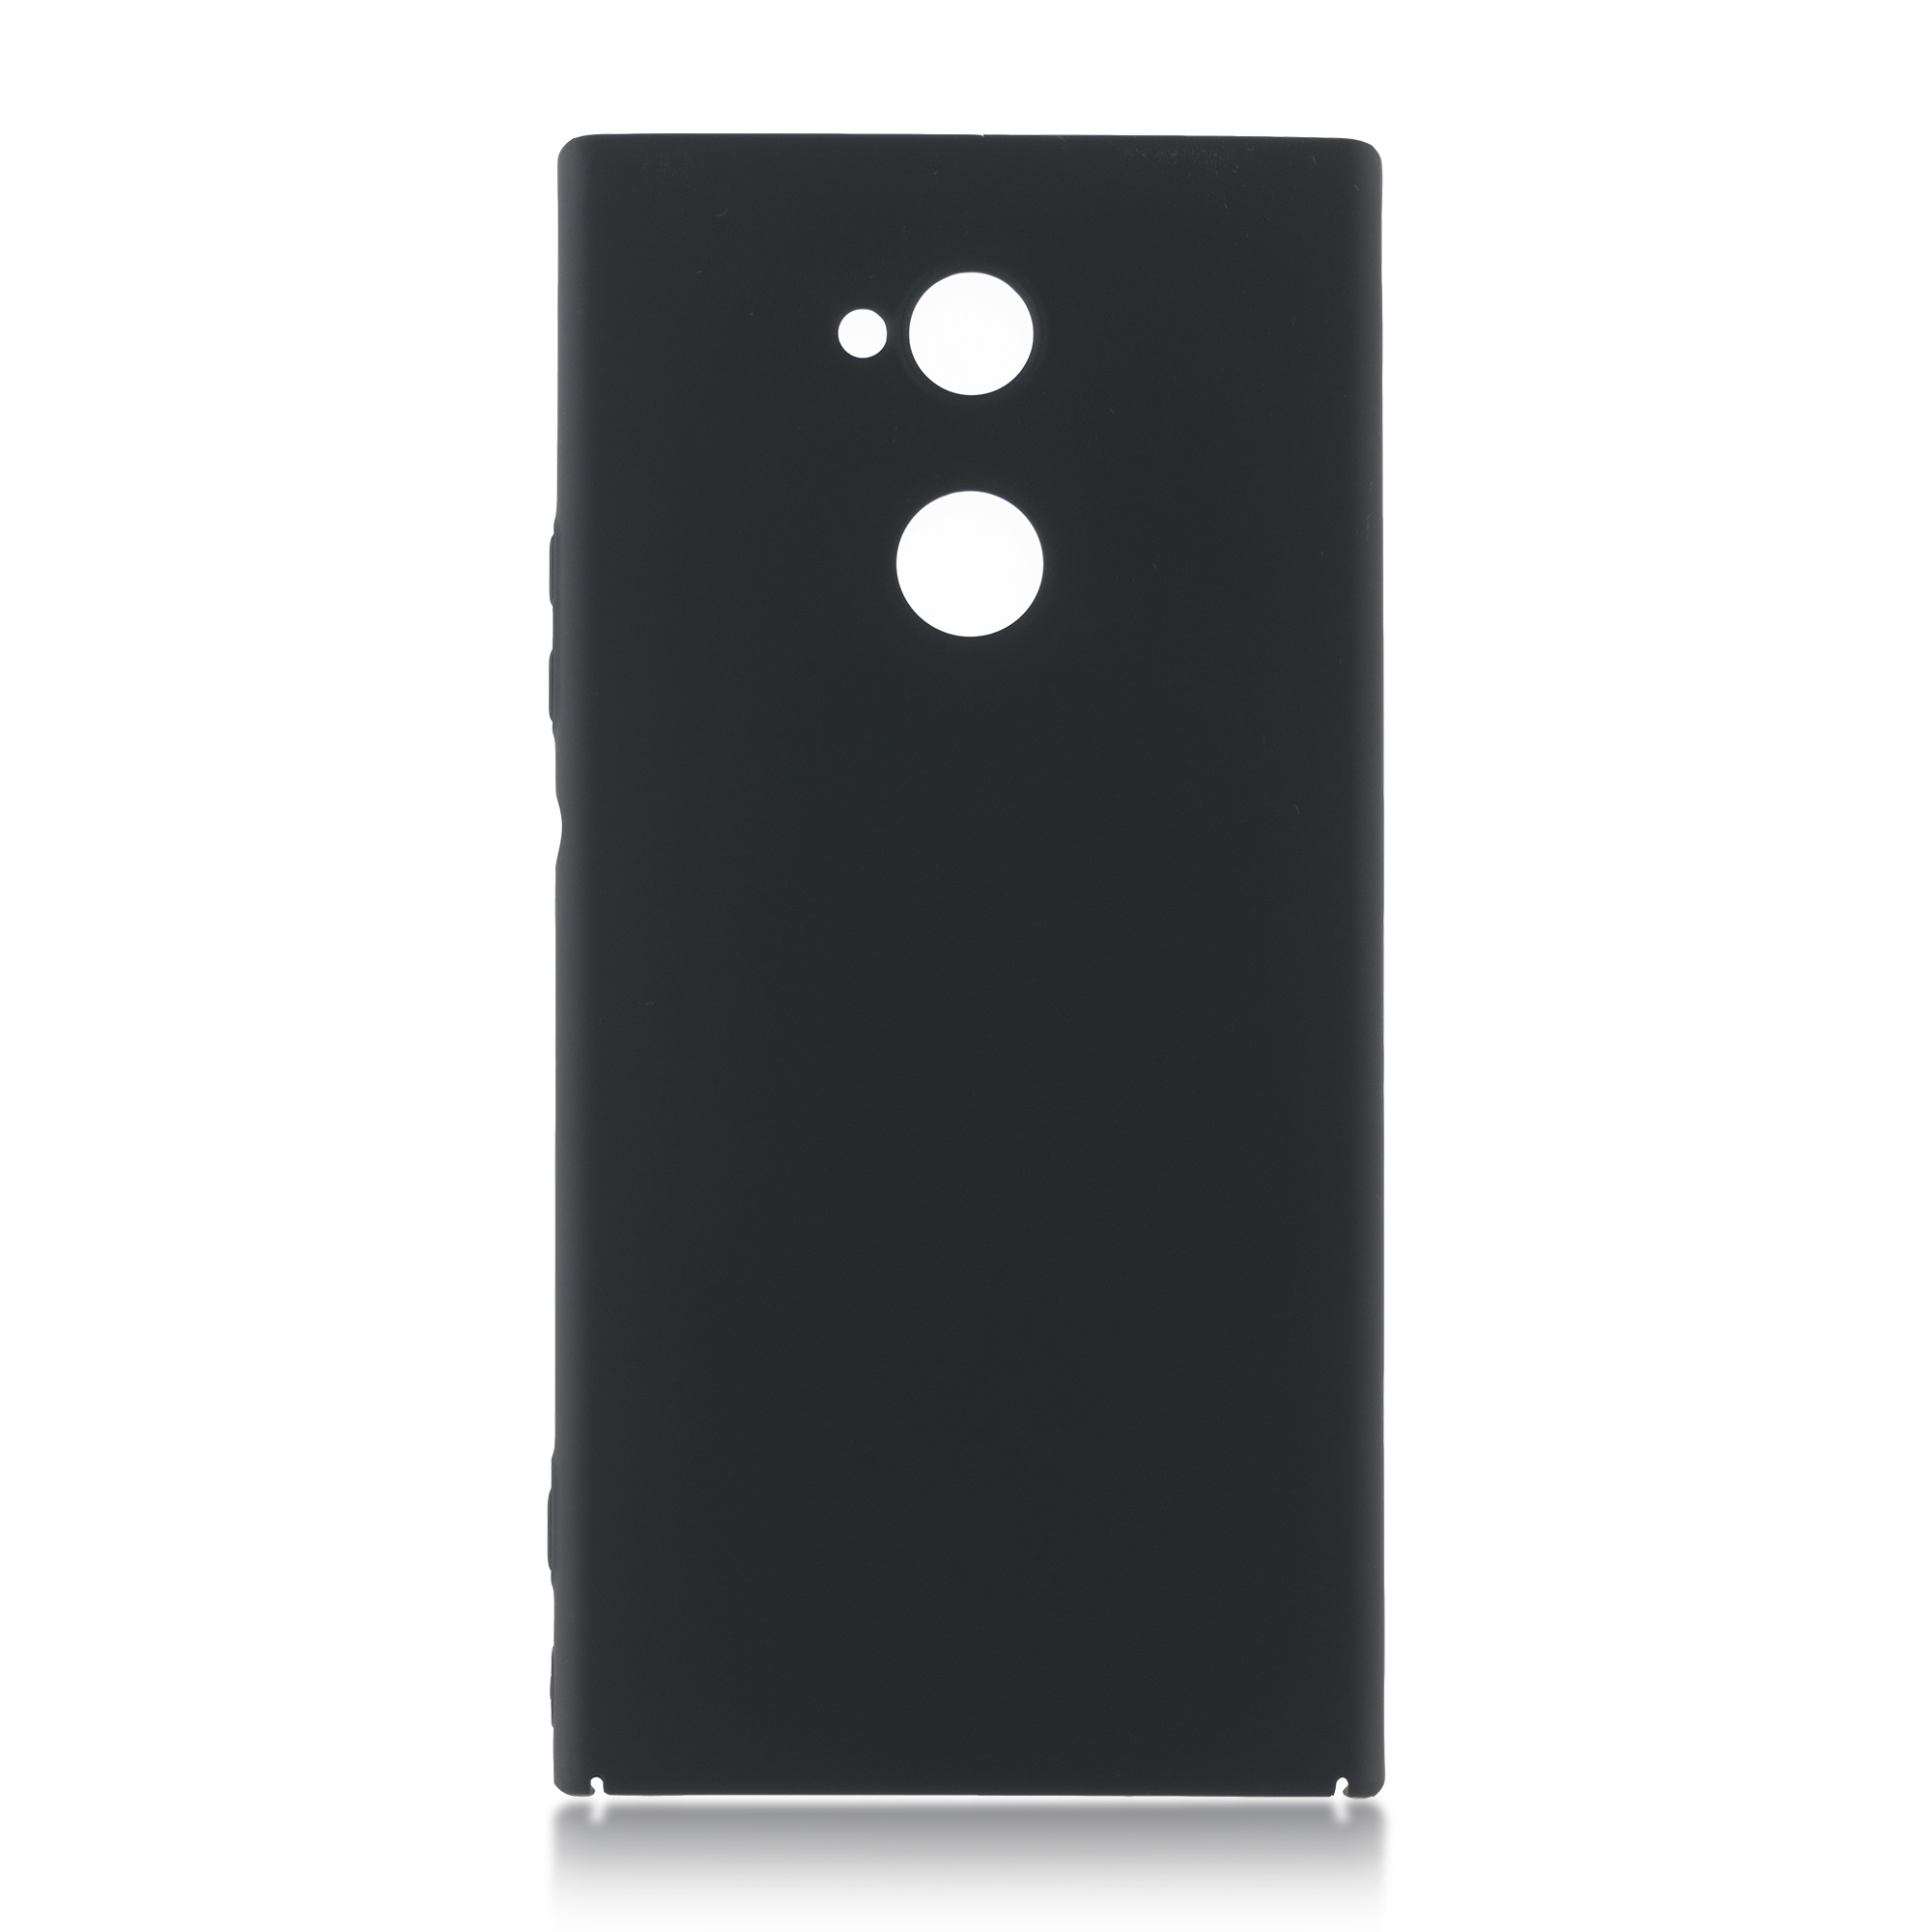 Накладка Brosco Soft-touch для Sony Xperia XA2 Ultra, черная